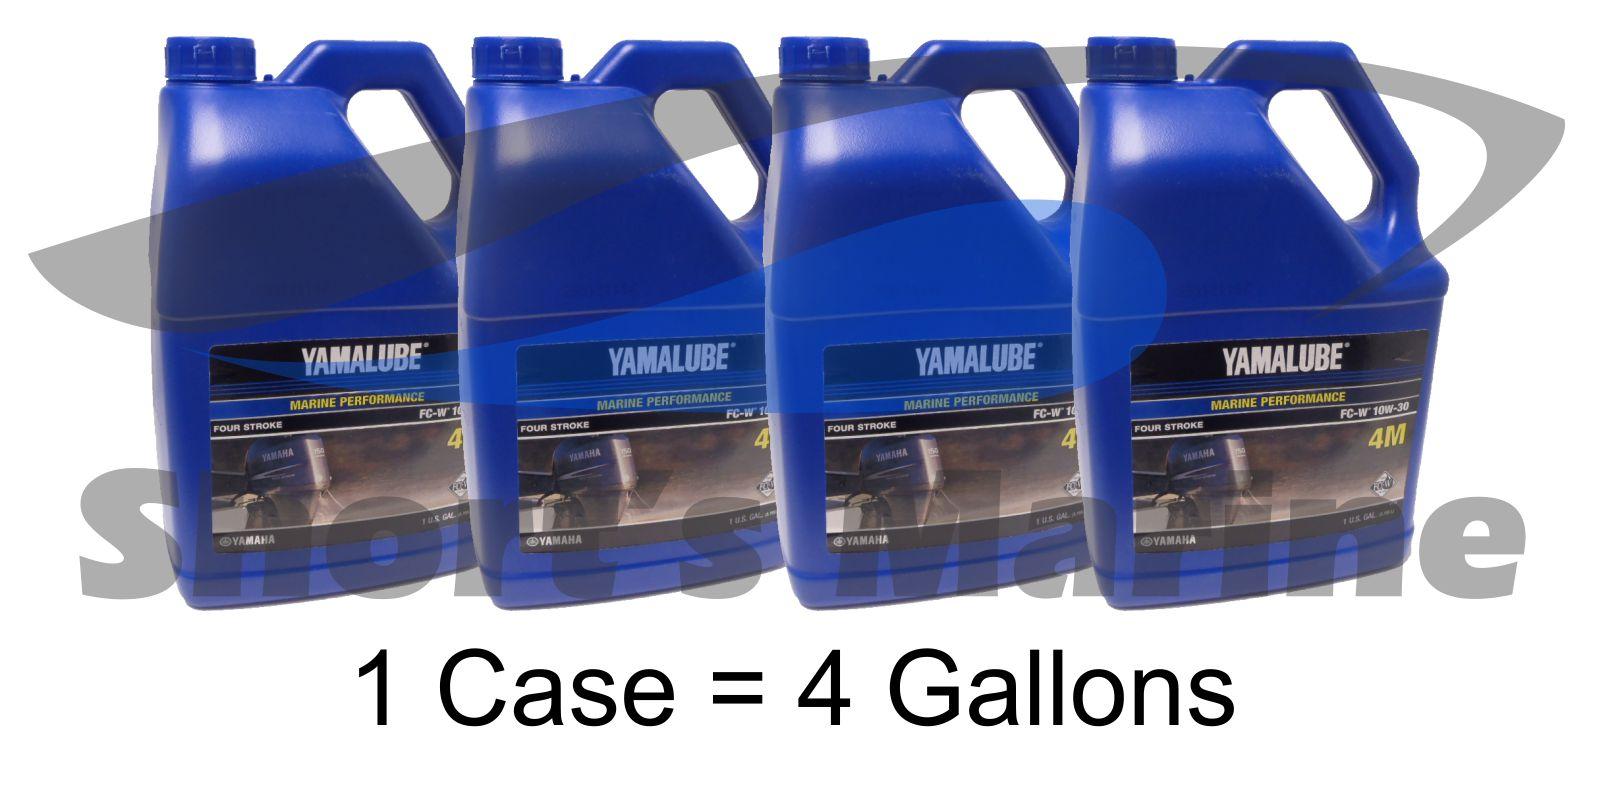 Yamaha 4 Stroke Engine Oil Case of 4 Gallons Yamalube